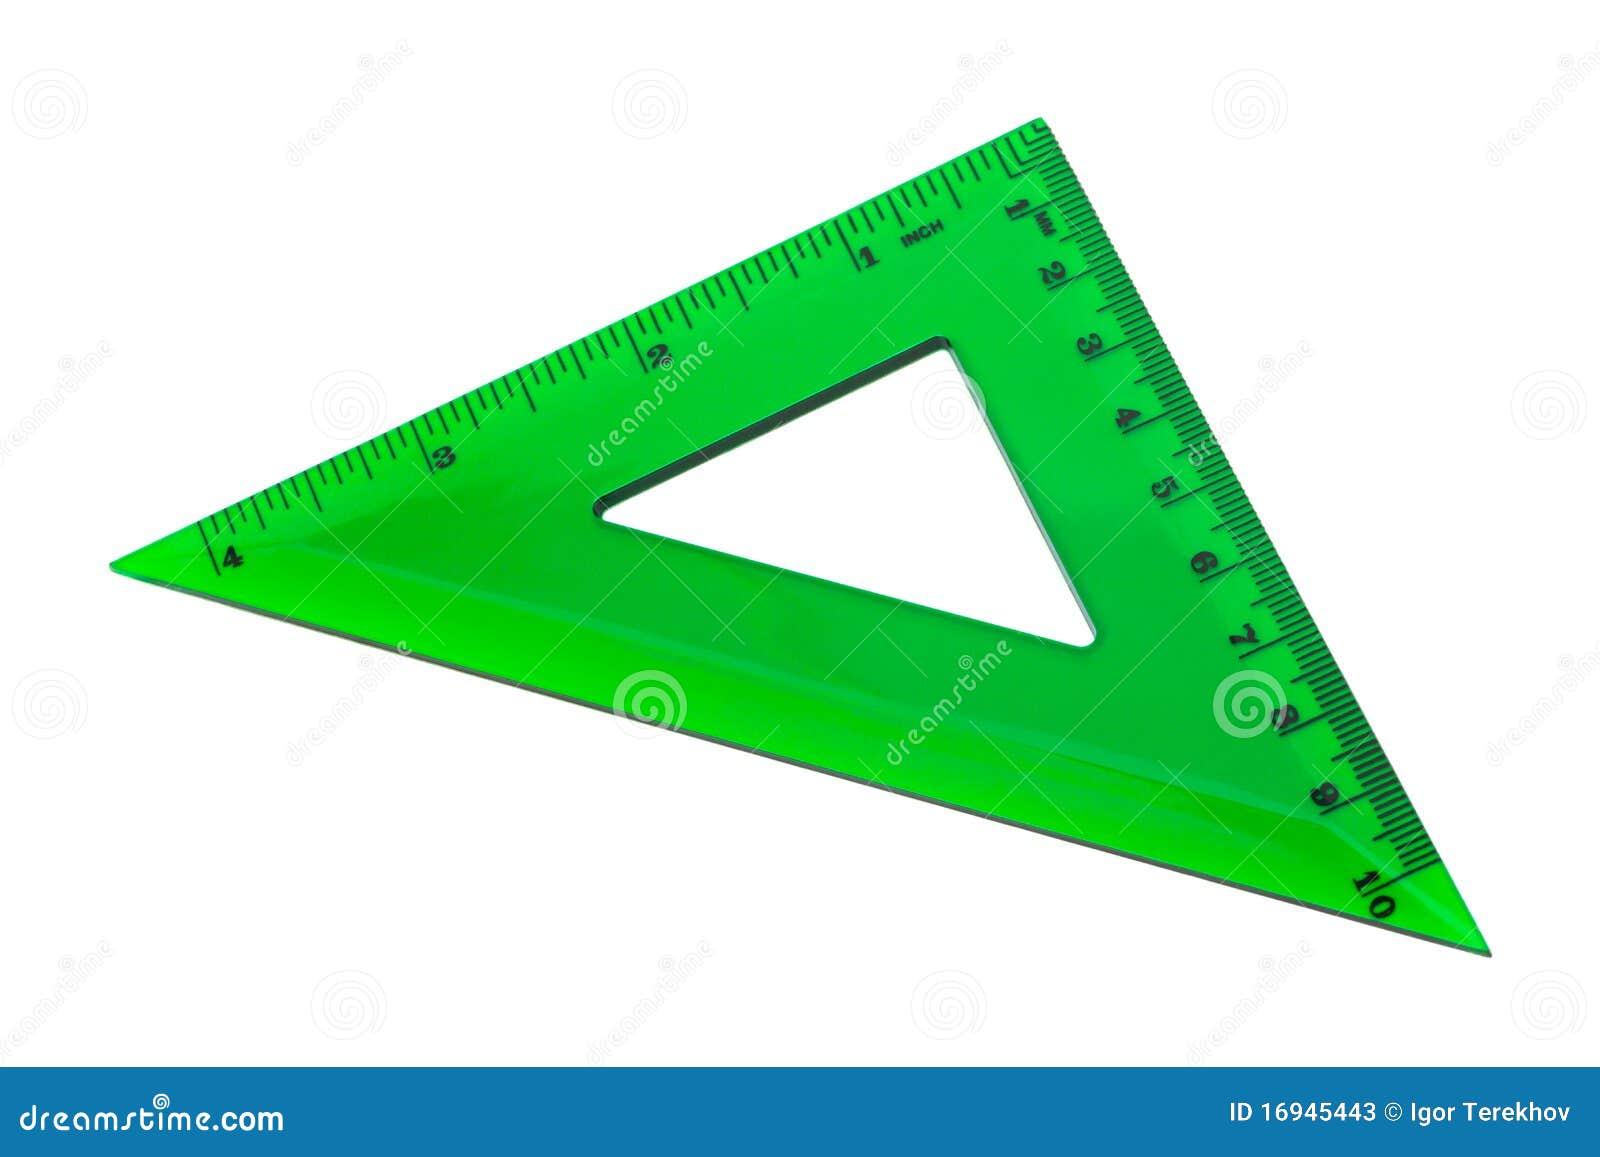 треугольник зелёный картинка